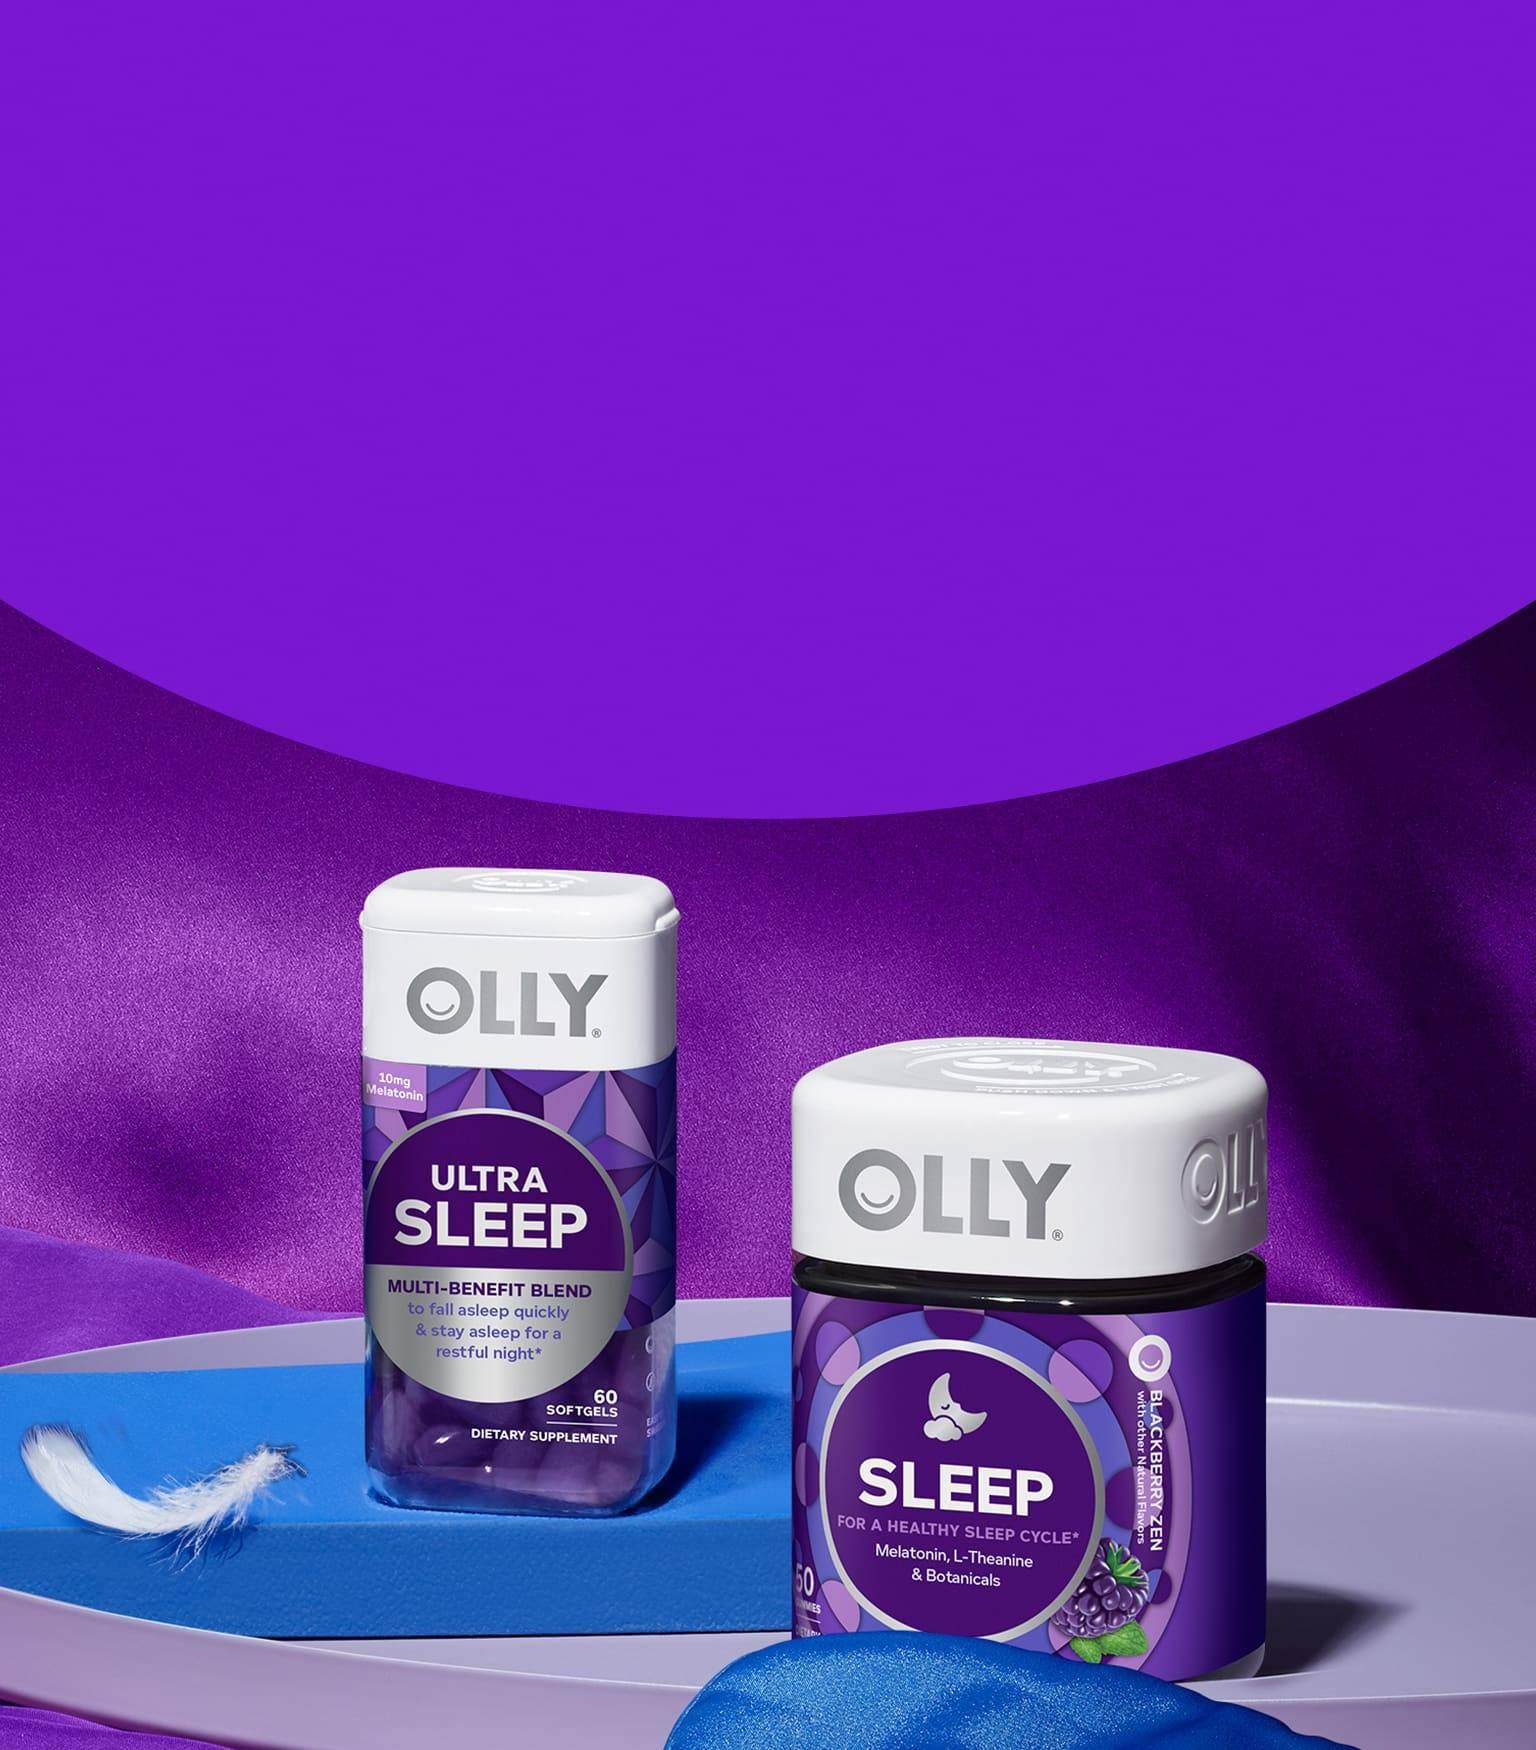 Sleep and Ultra Sleep